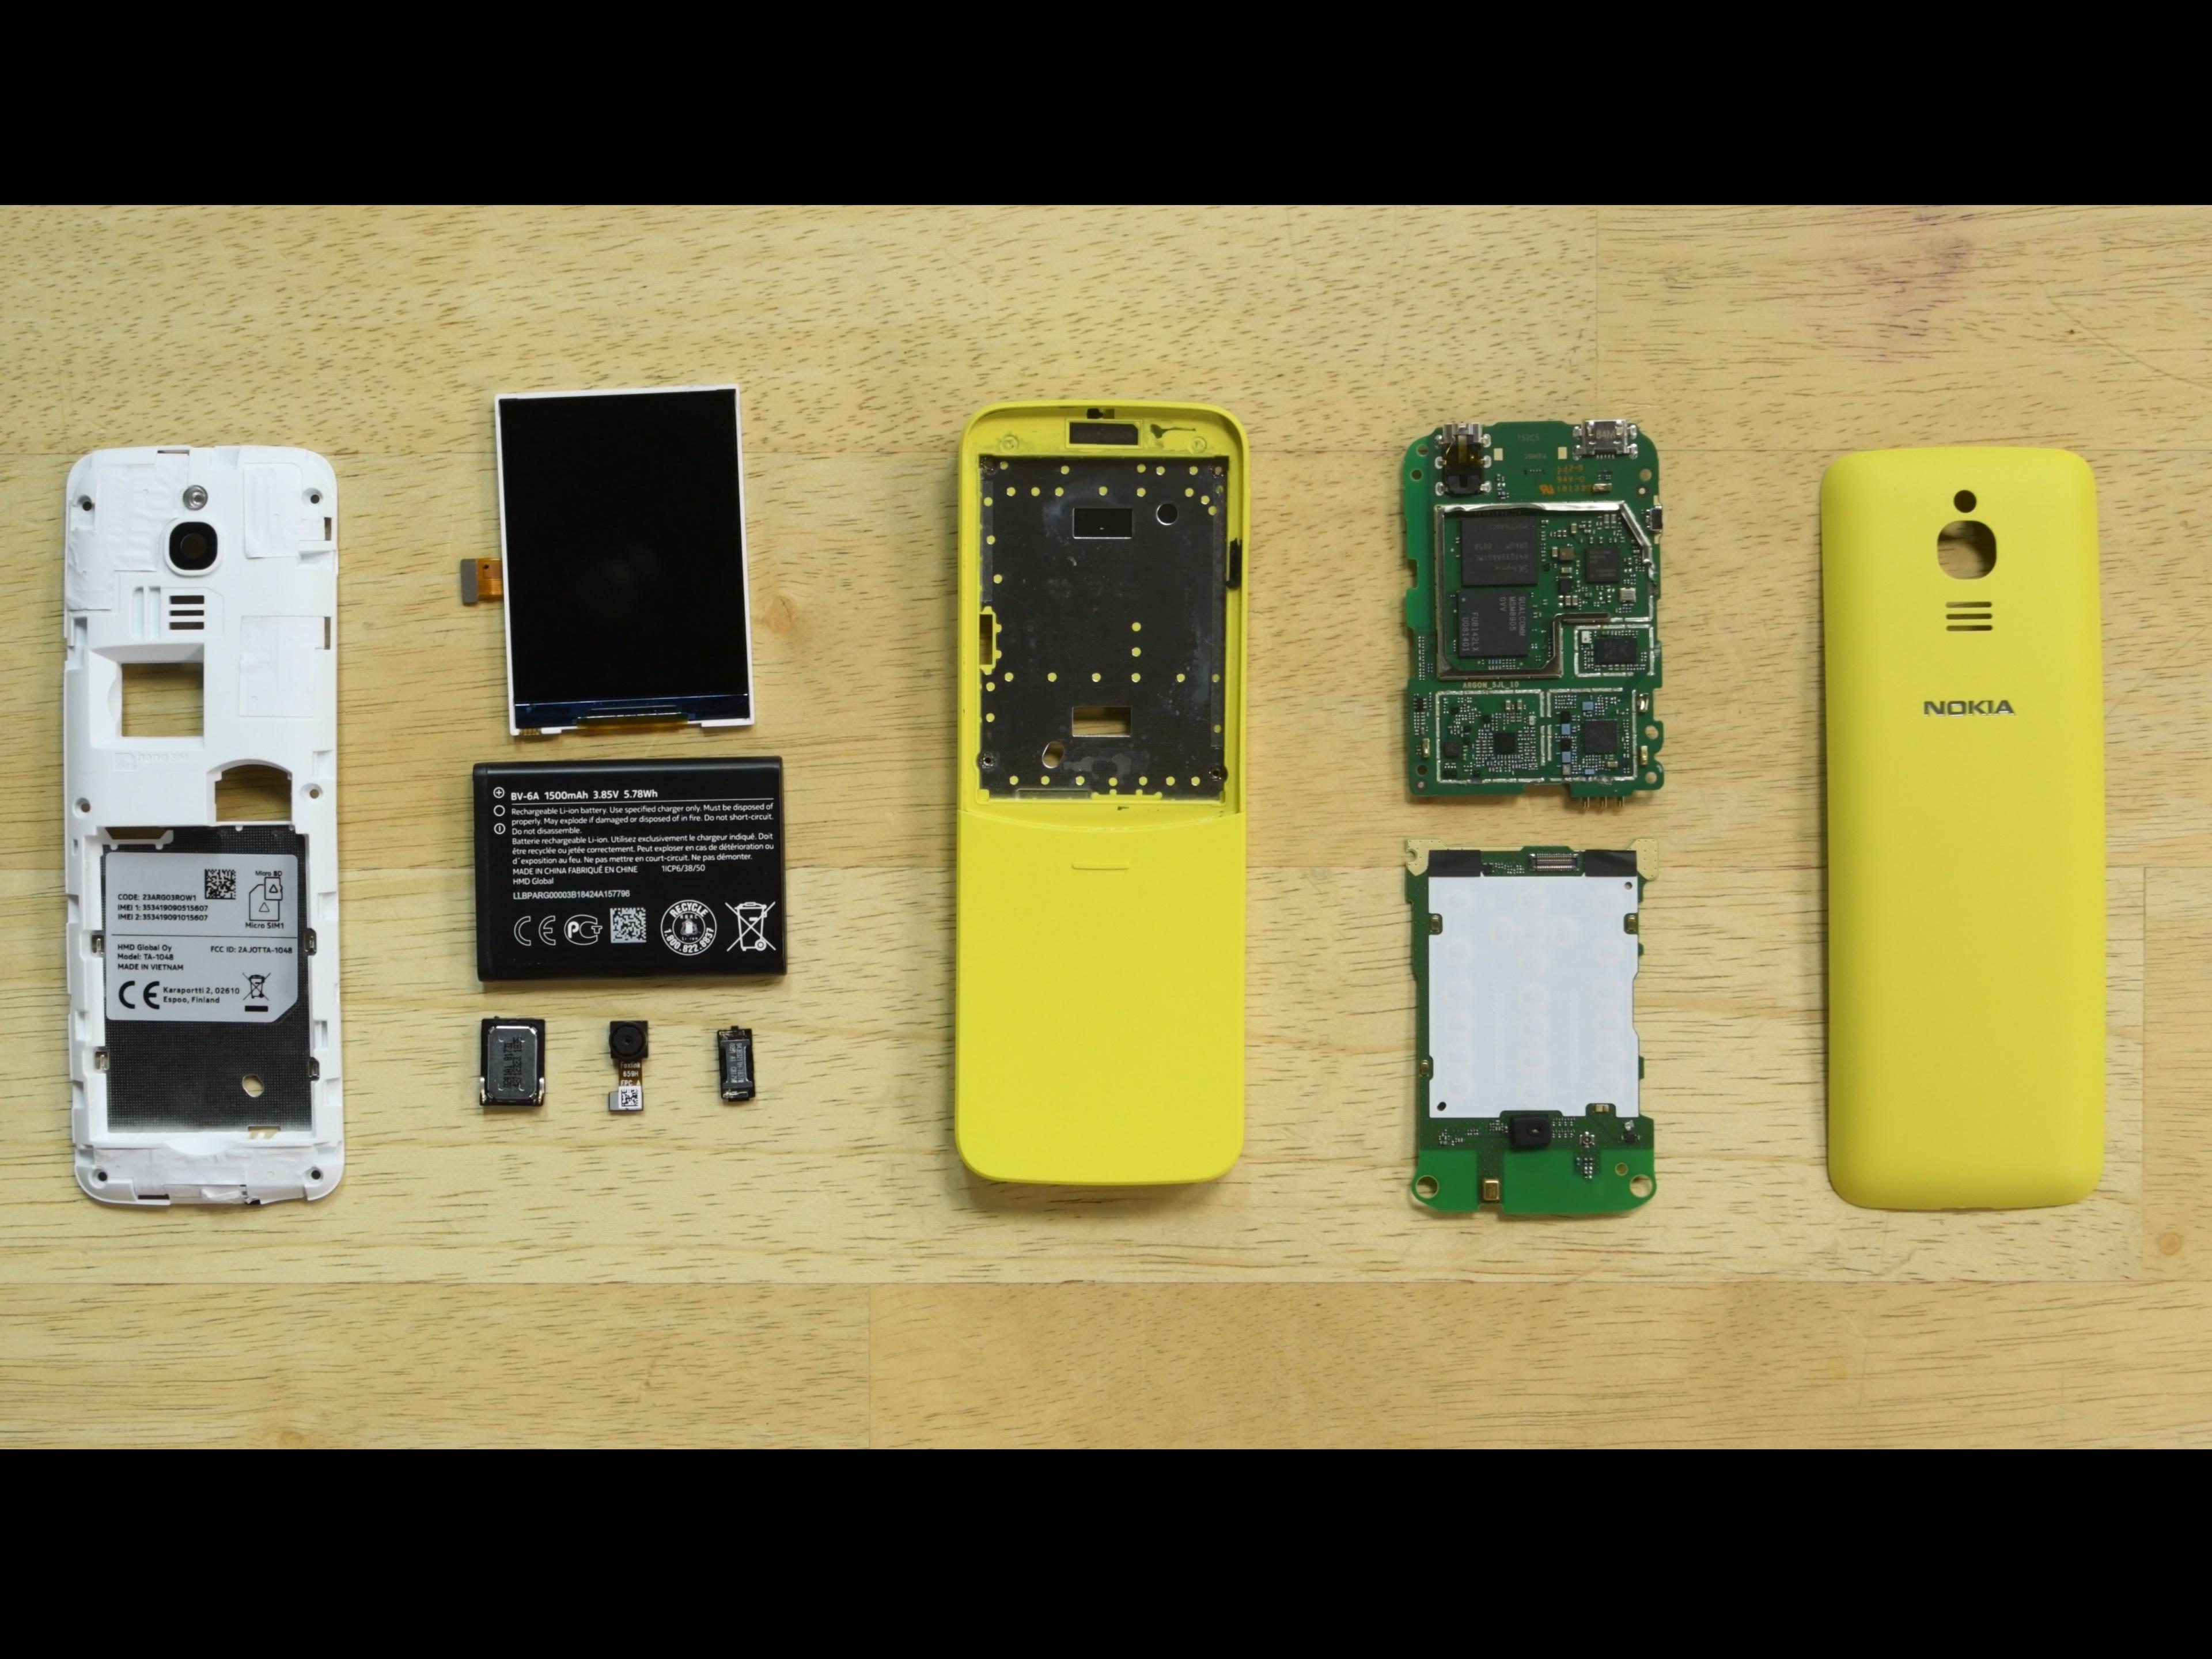 Nokia Banana Phone (Nokia 8110 4G) Teardown